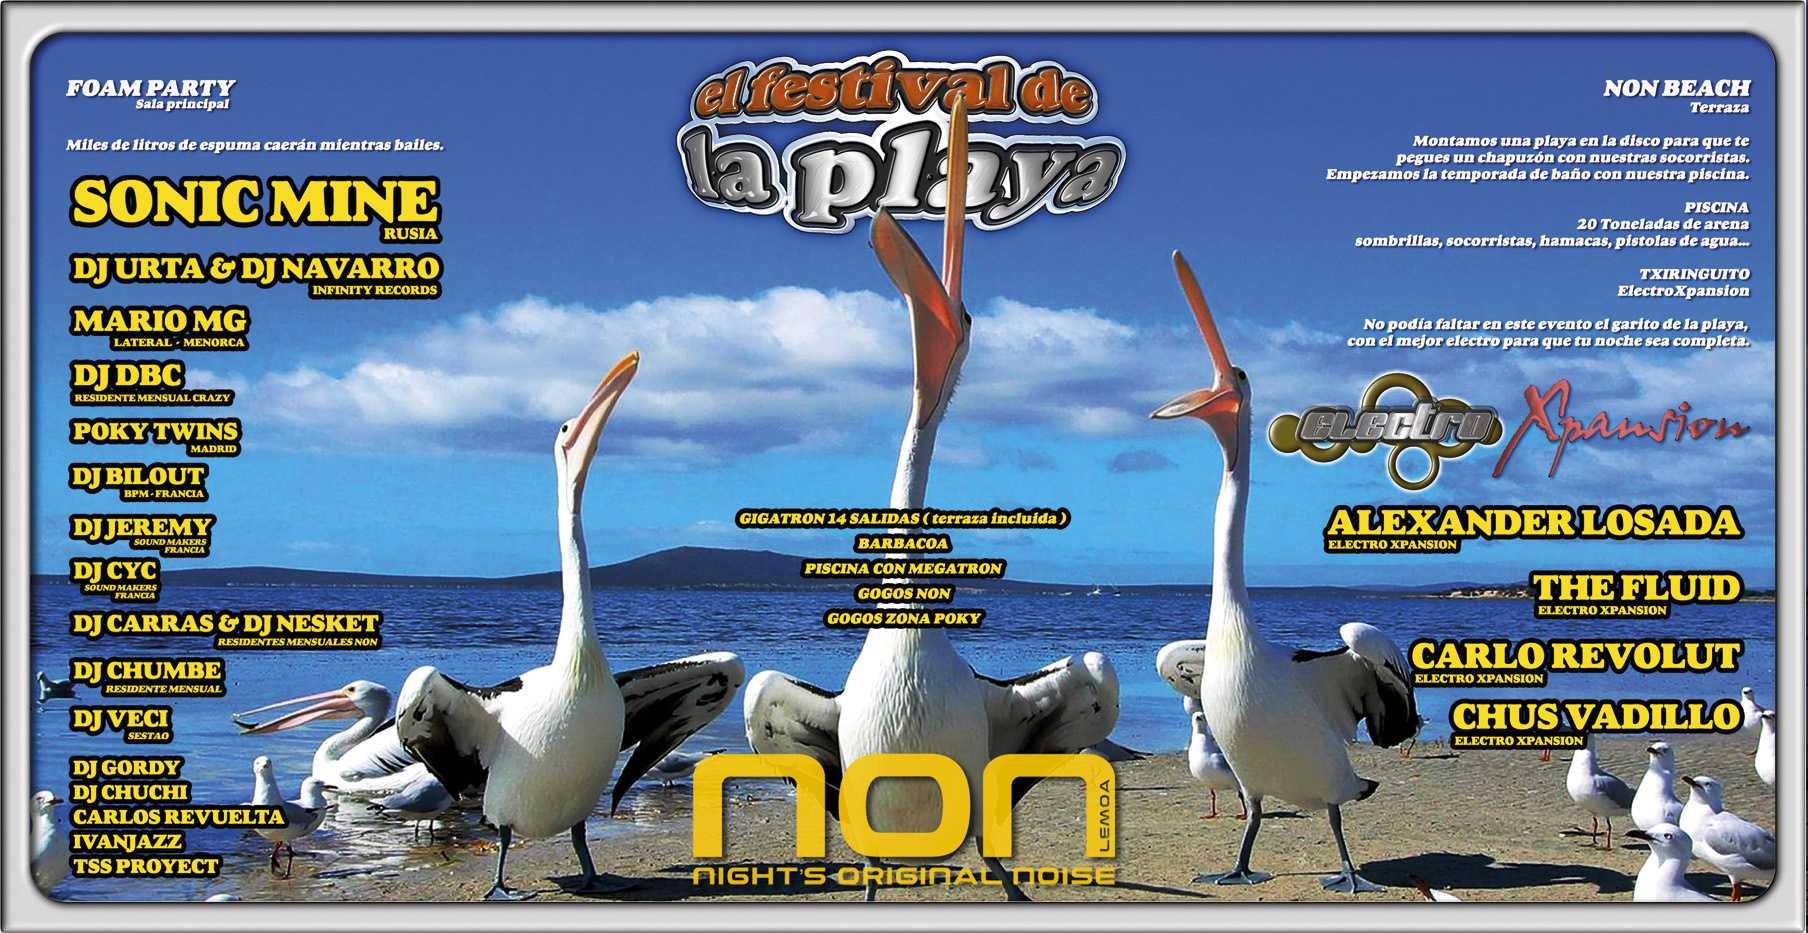 CyC & Jeremy (Sound Makers) @ El Festival de la playa (NON/Spain)